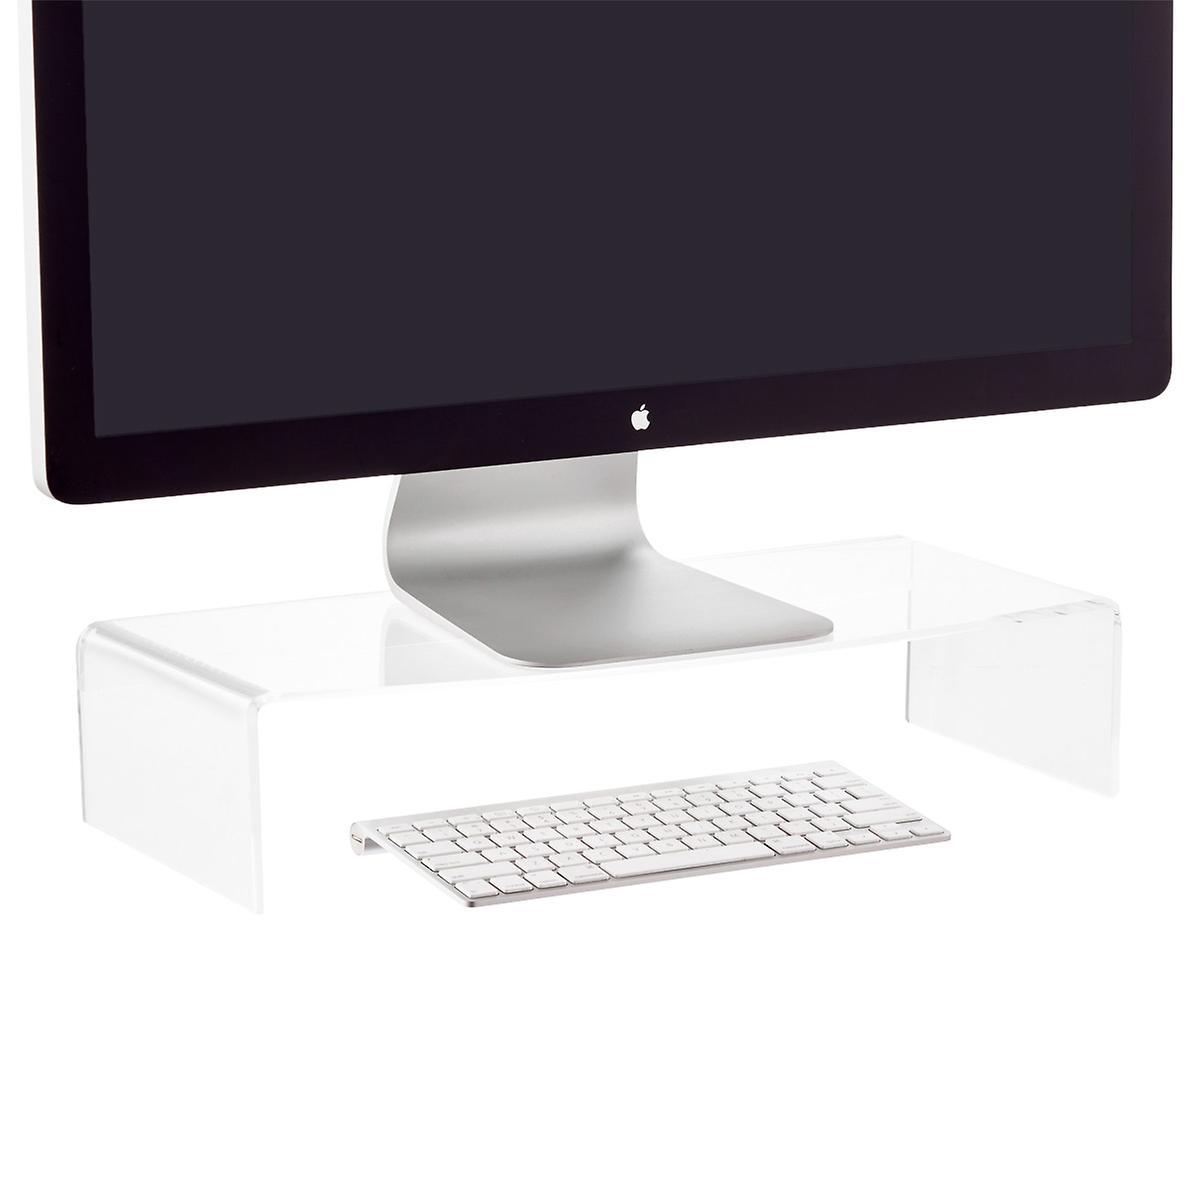 Clear Acrylic Monitor Riser